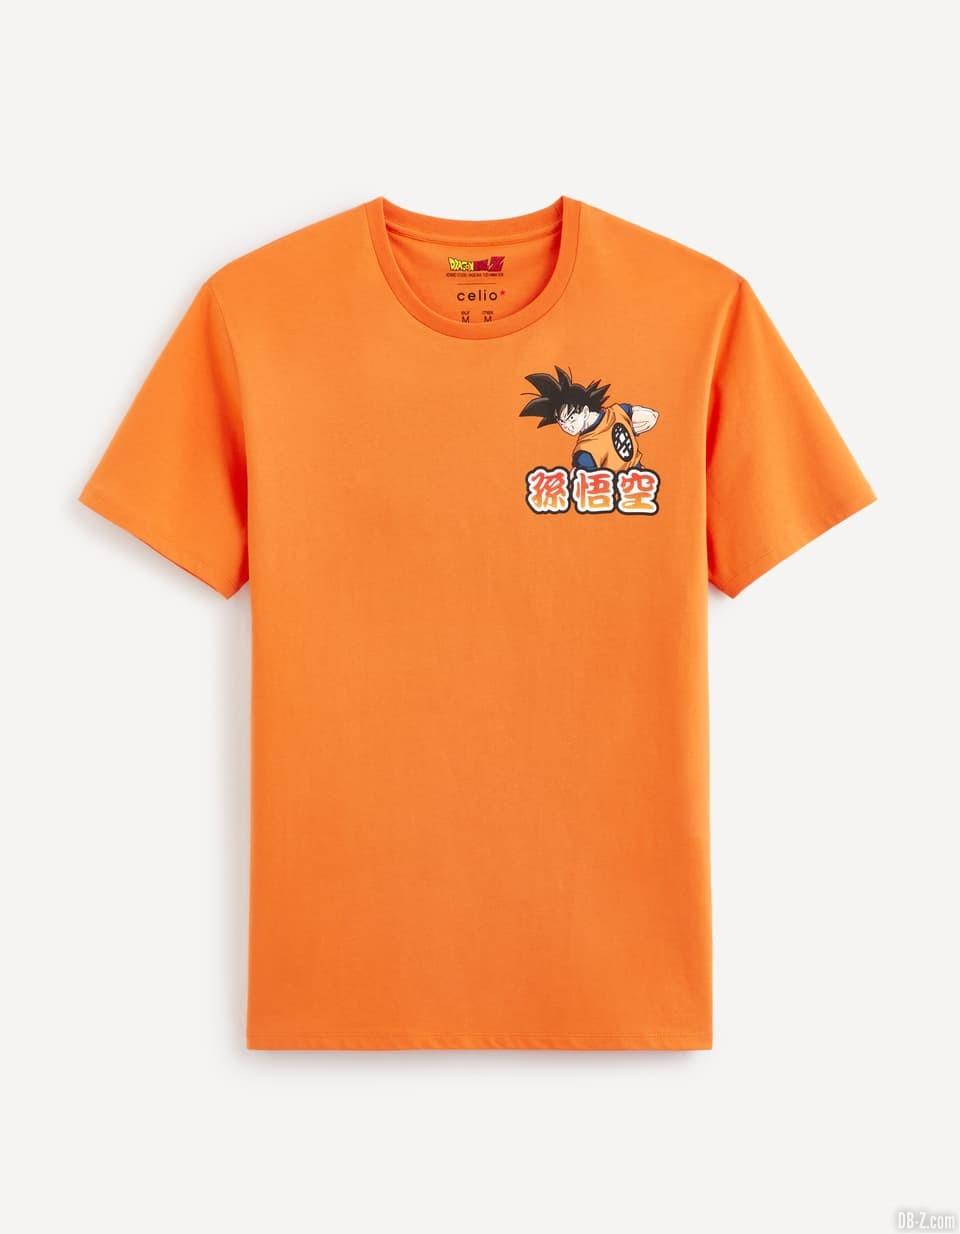 Celio Dragon Ball Z T Shirt 9